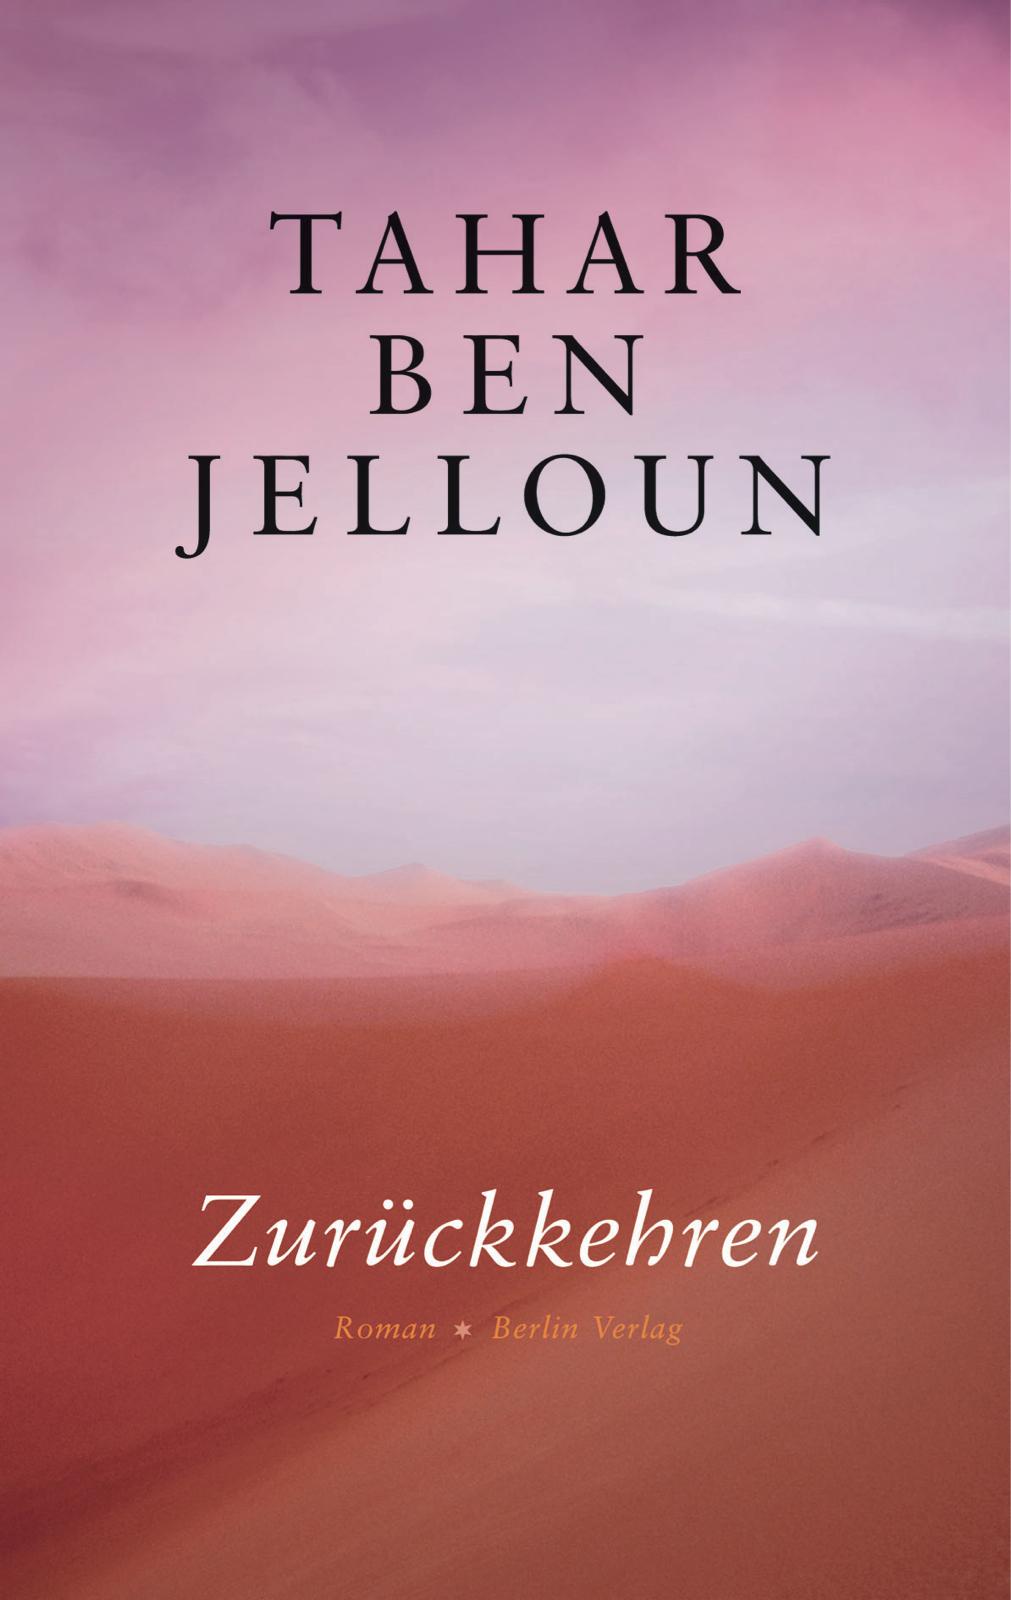 Tahar Ben Jelloun. Zurückkehren. Roman